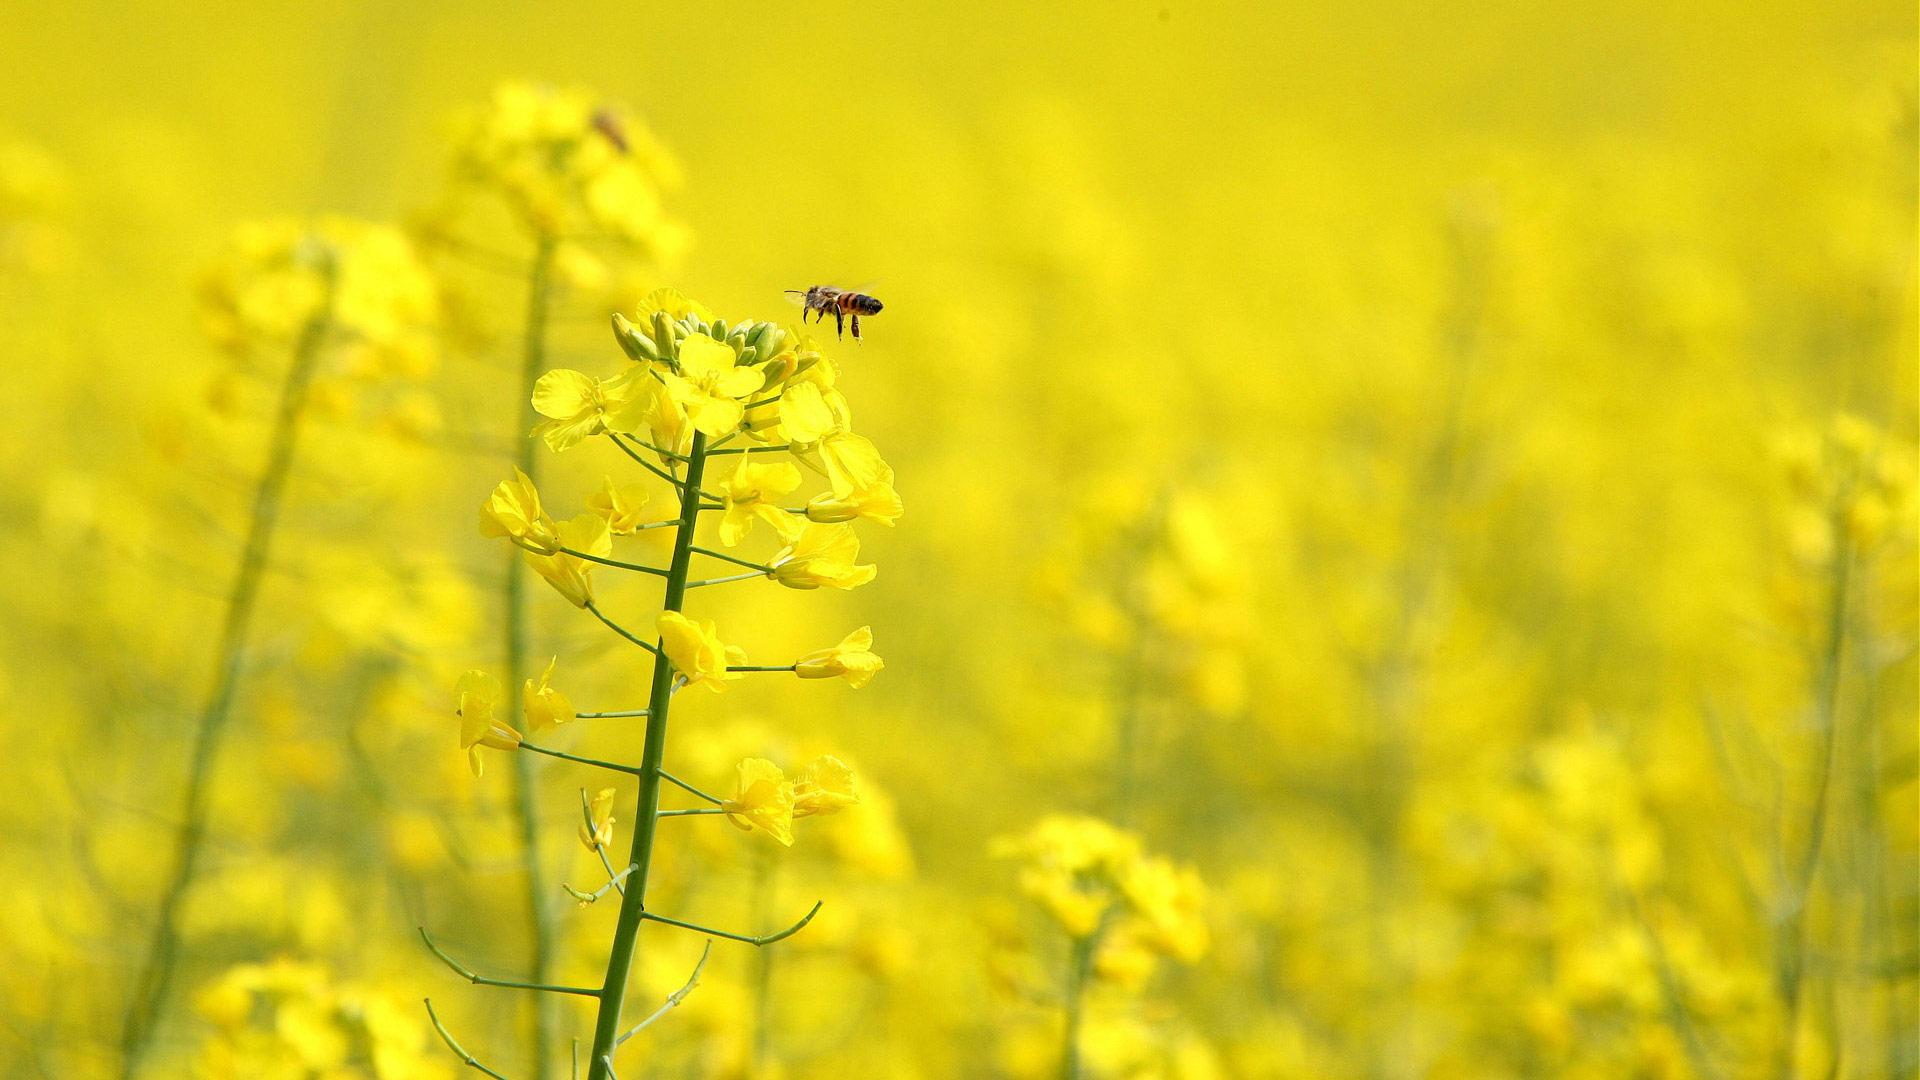 Yellow Flower Wallpaper HD